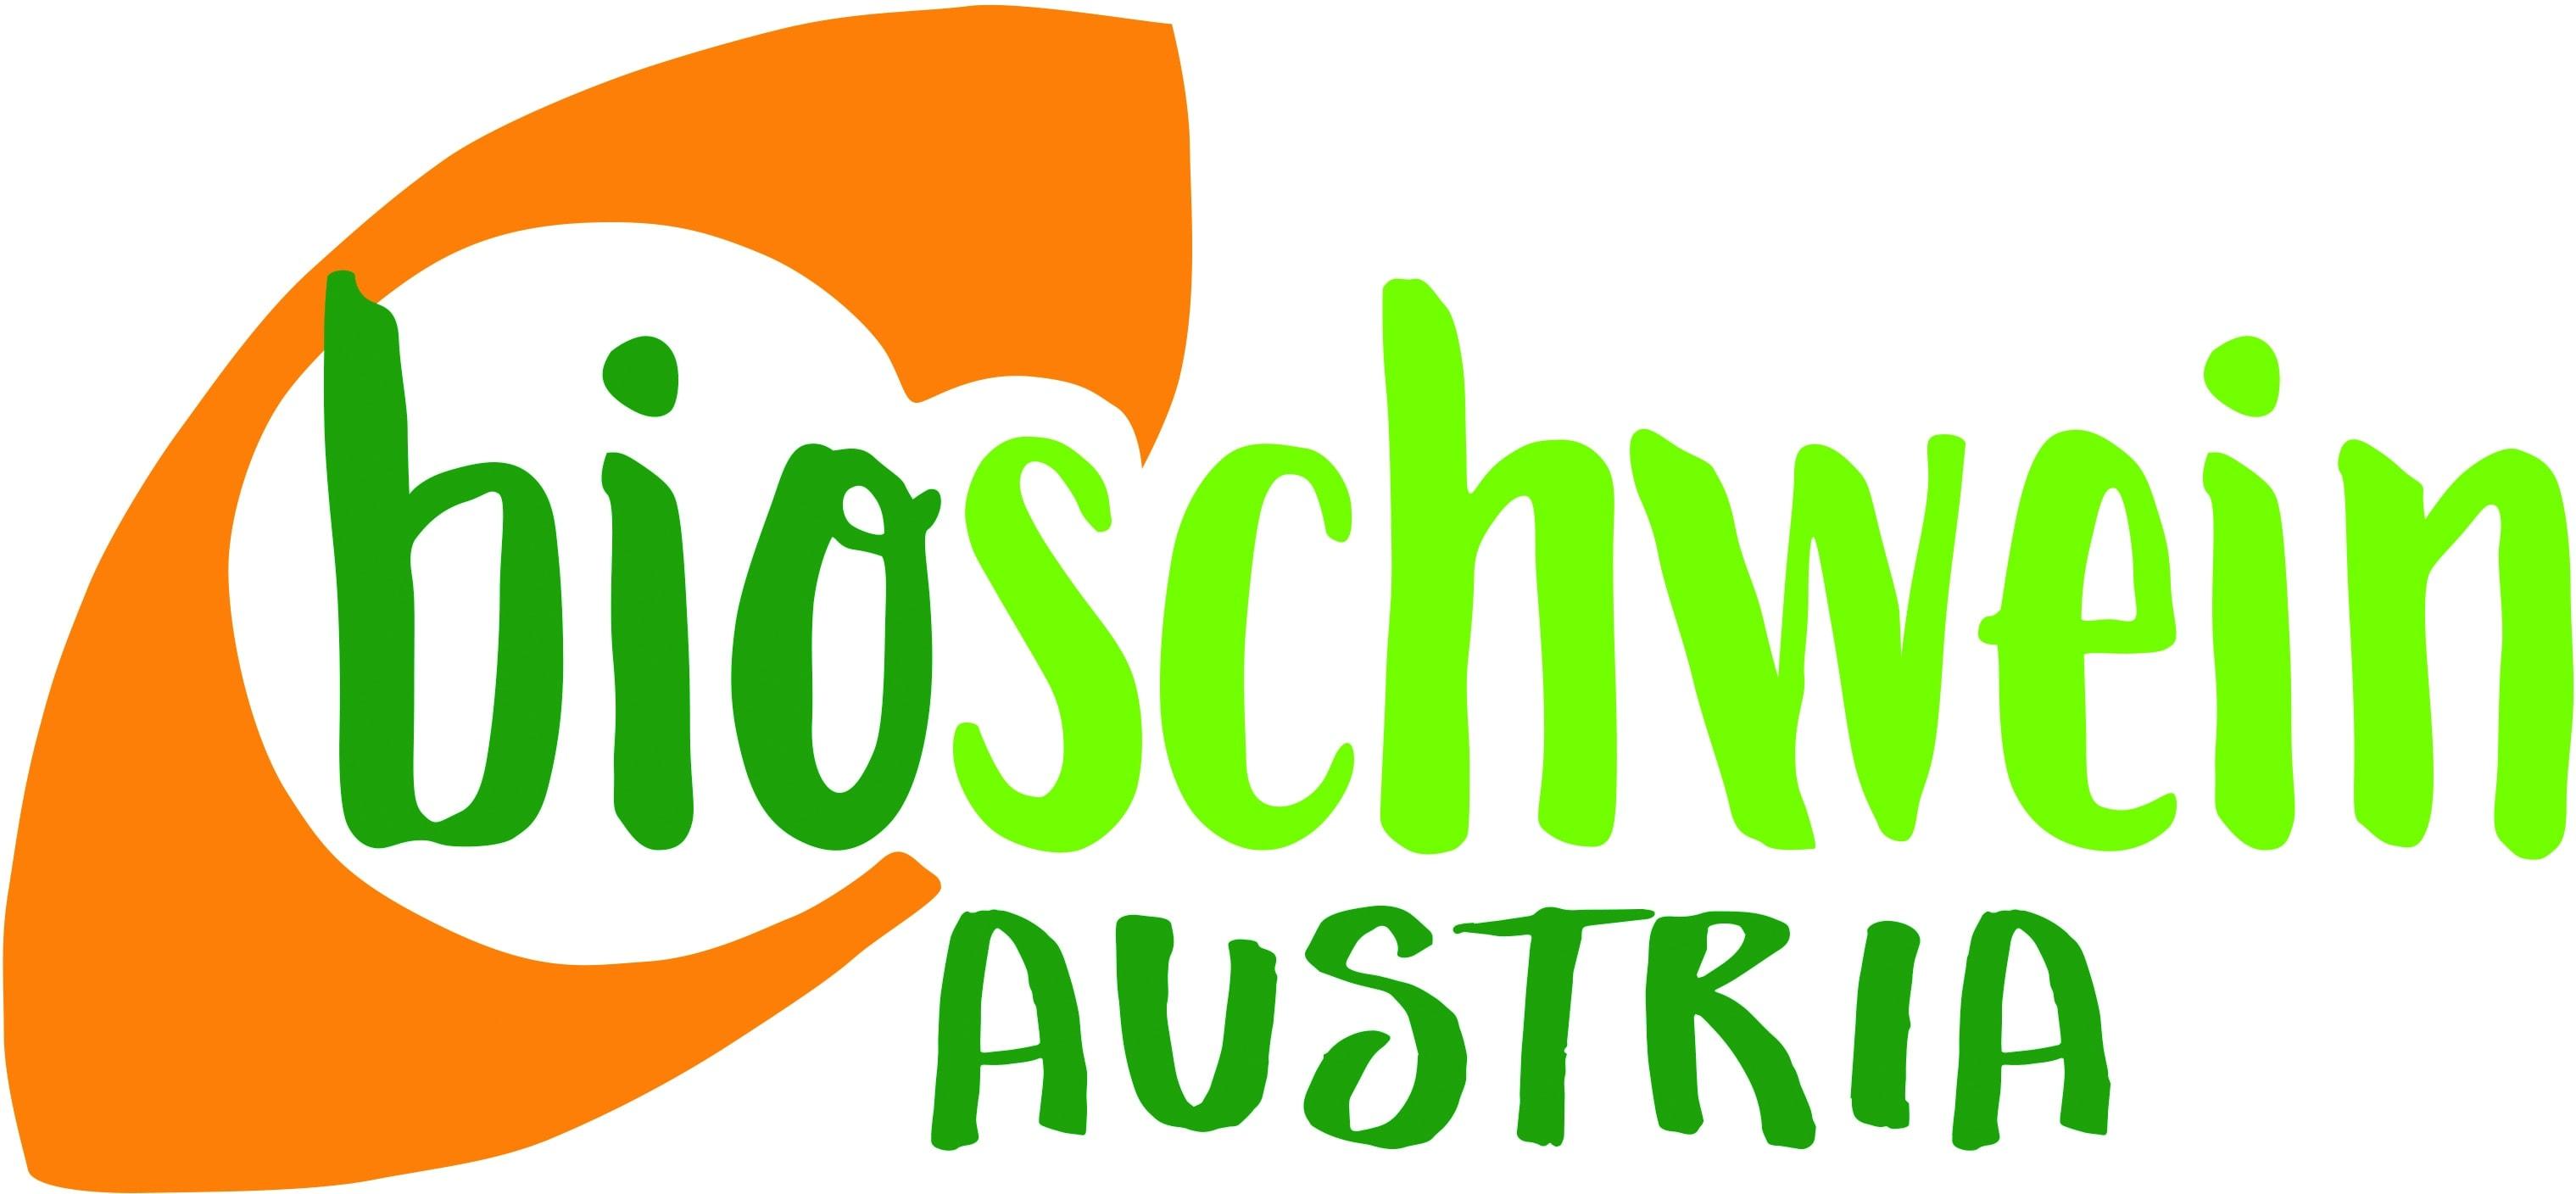 bioschwein-austria-logo